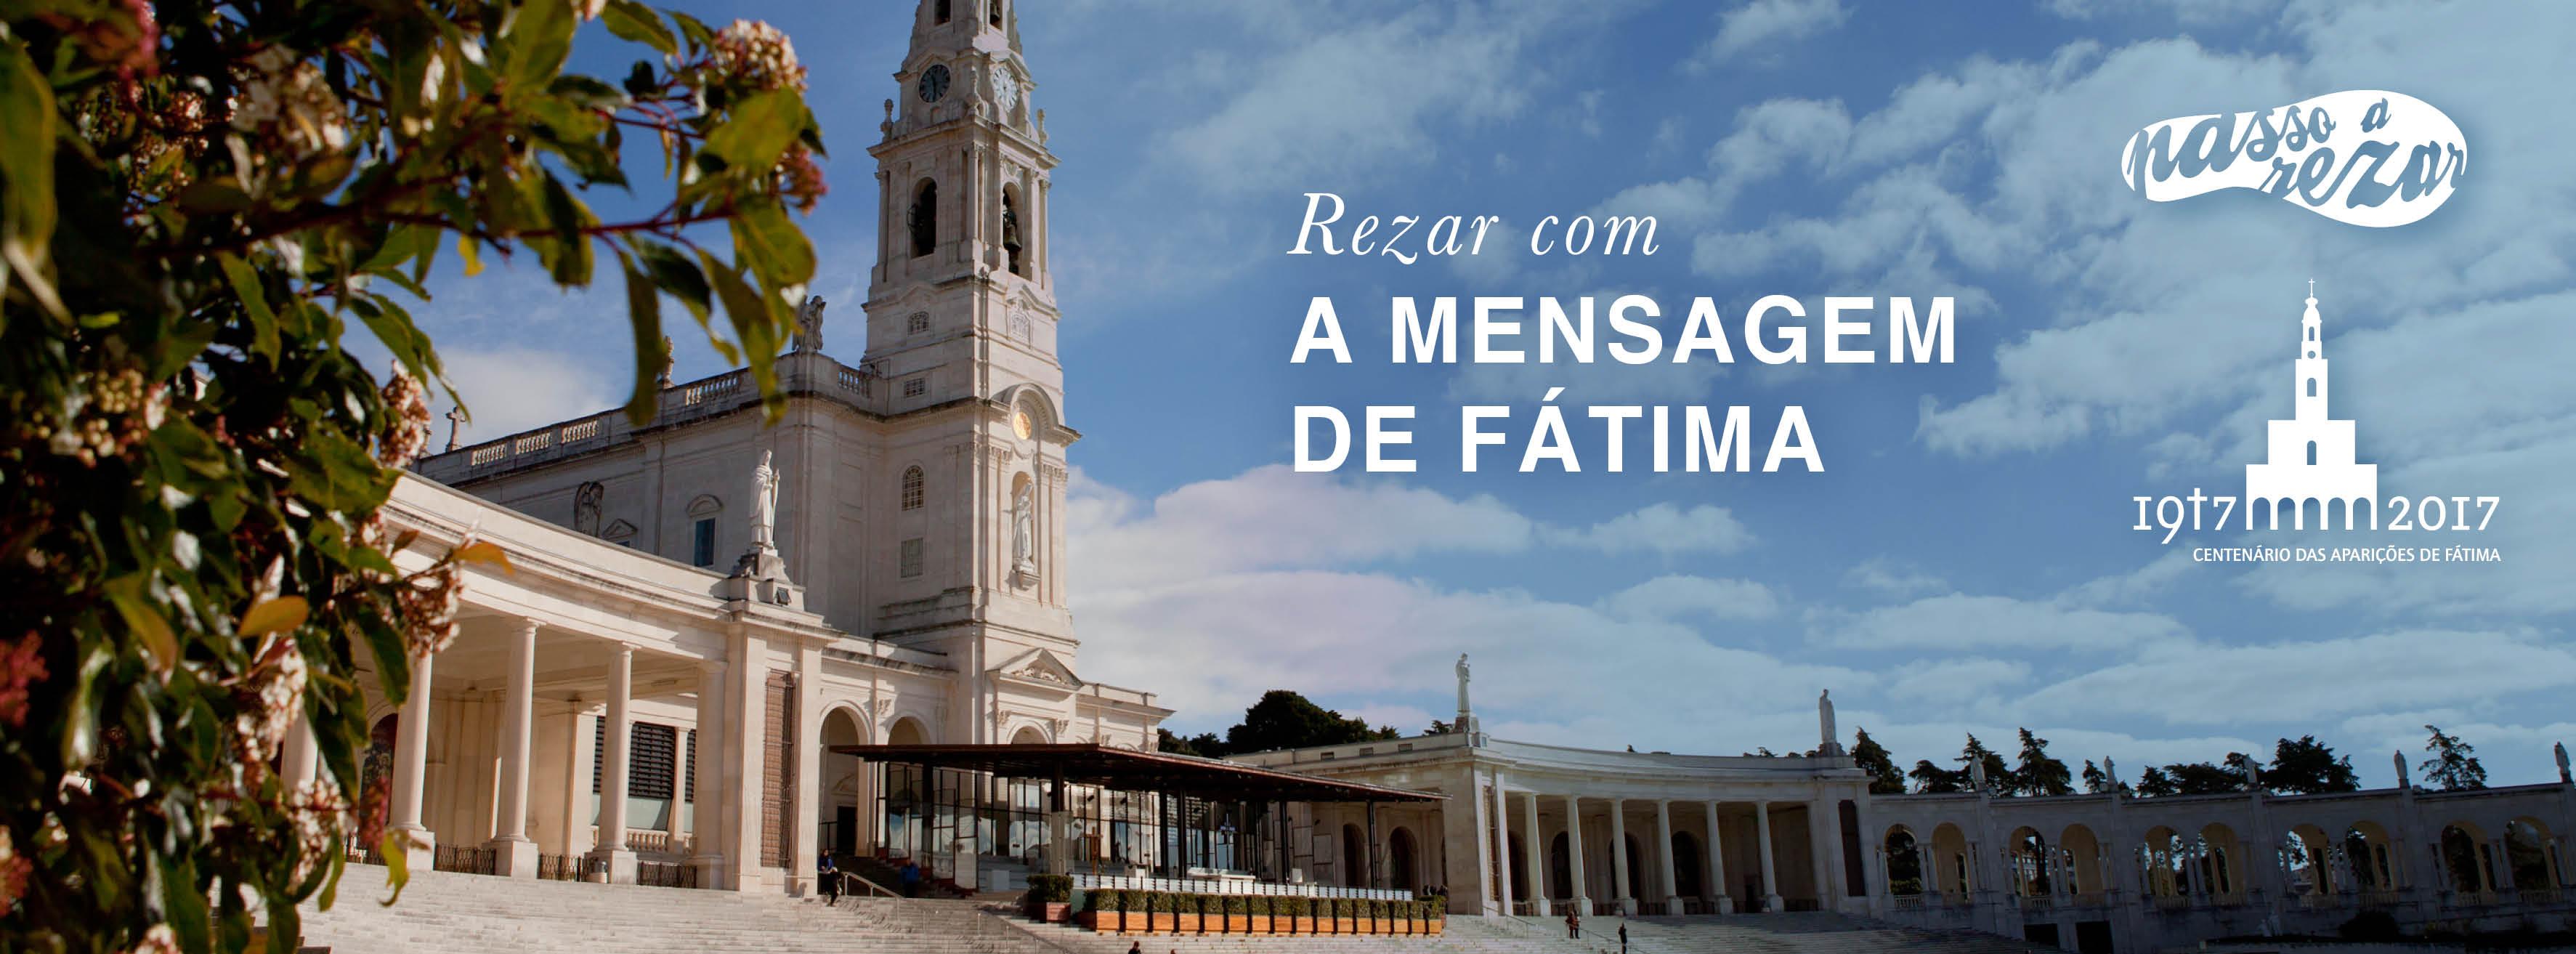 centenario de Fatima_3.jpg